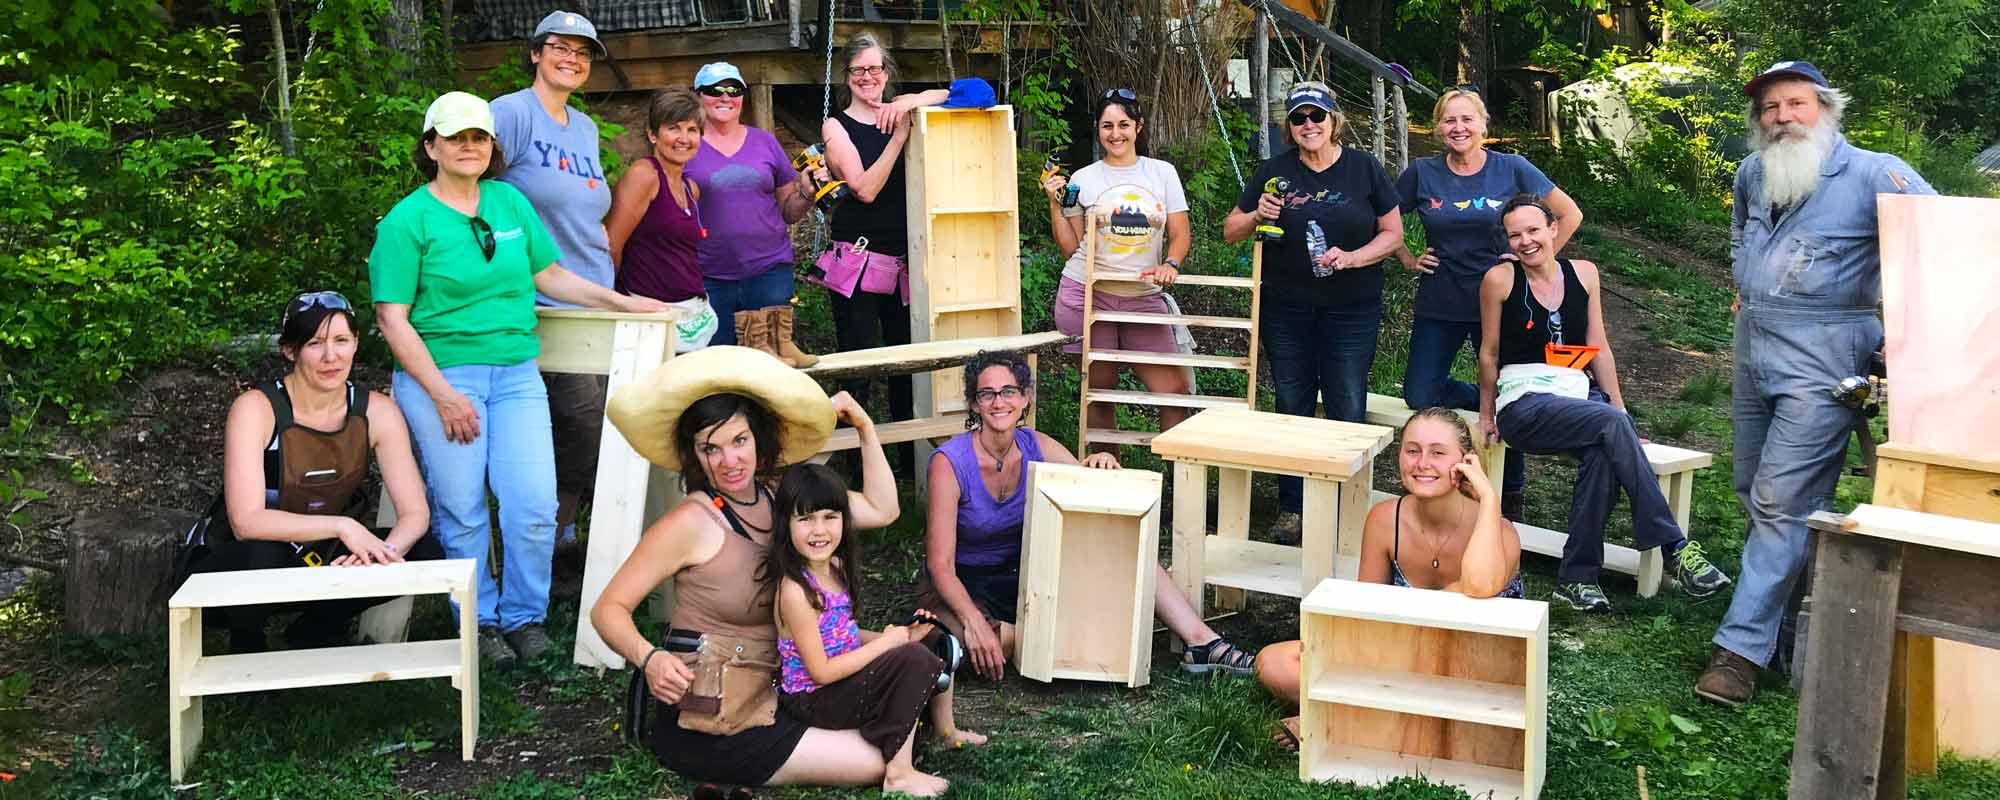 Women S Basic Carpentry And Woodworking Class 2020 Wild Abundance